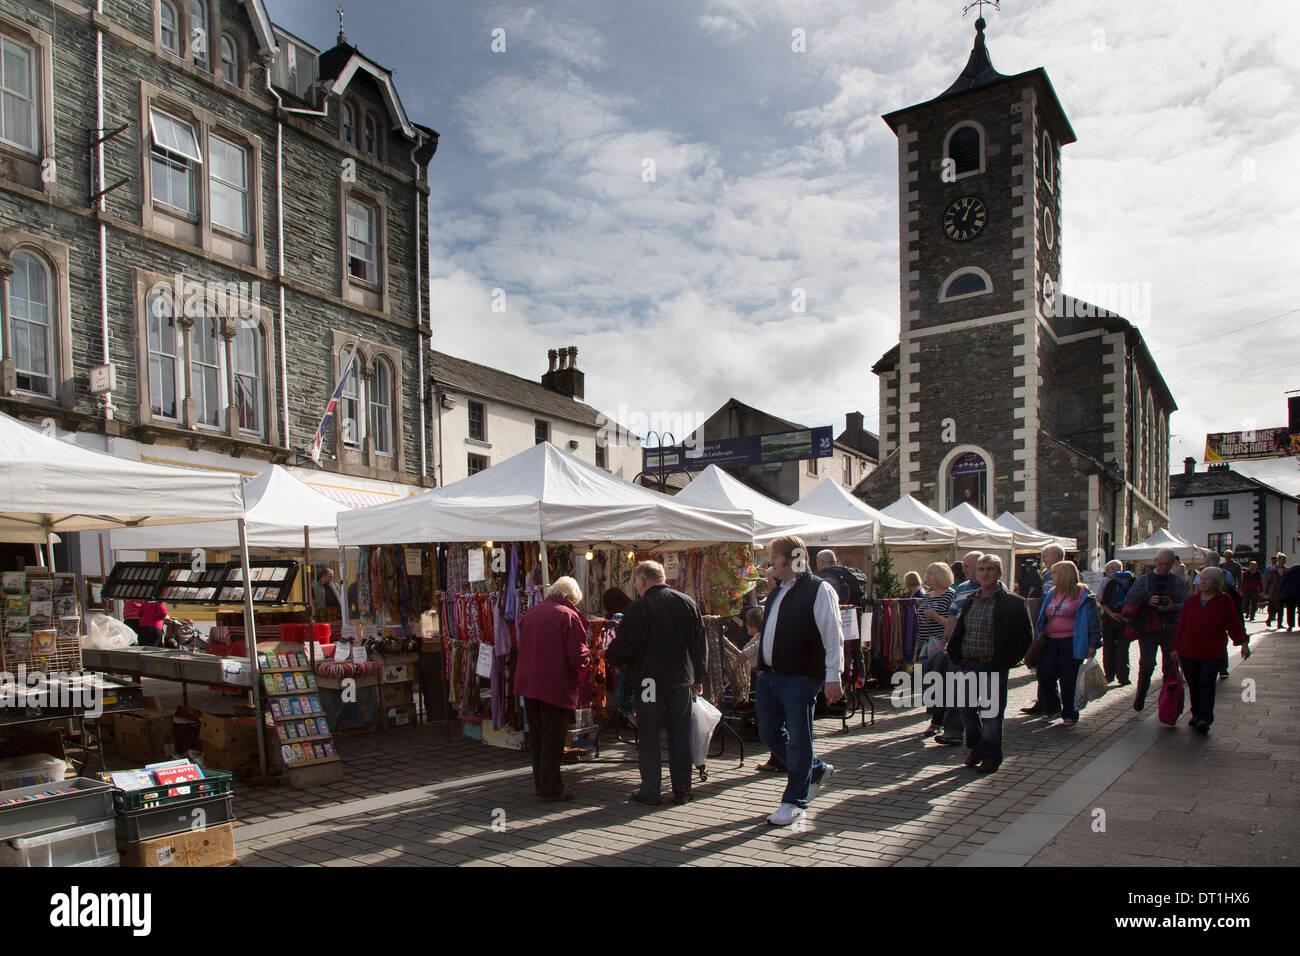 Market Square Thursday Market Day, Keswick, Cumbria - Stock Image